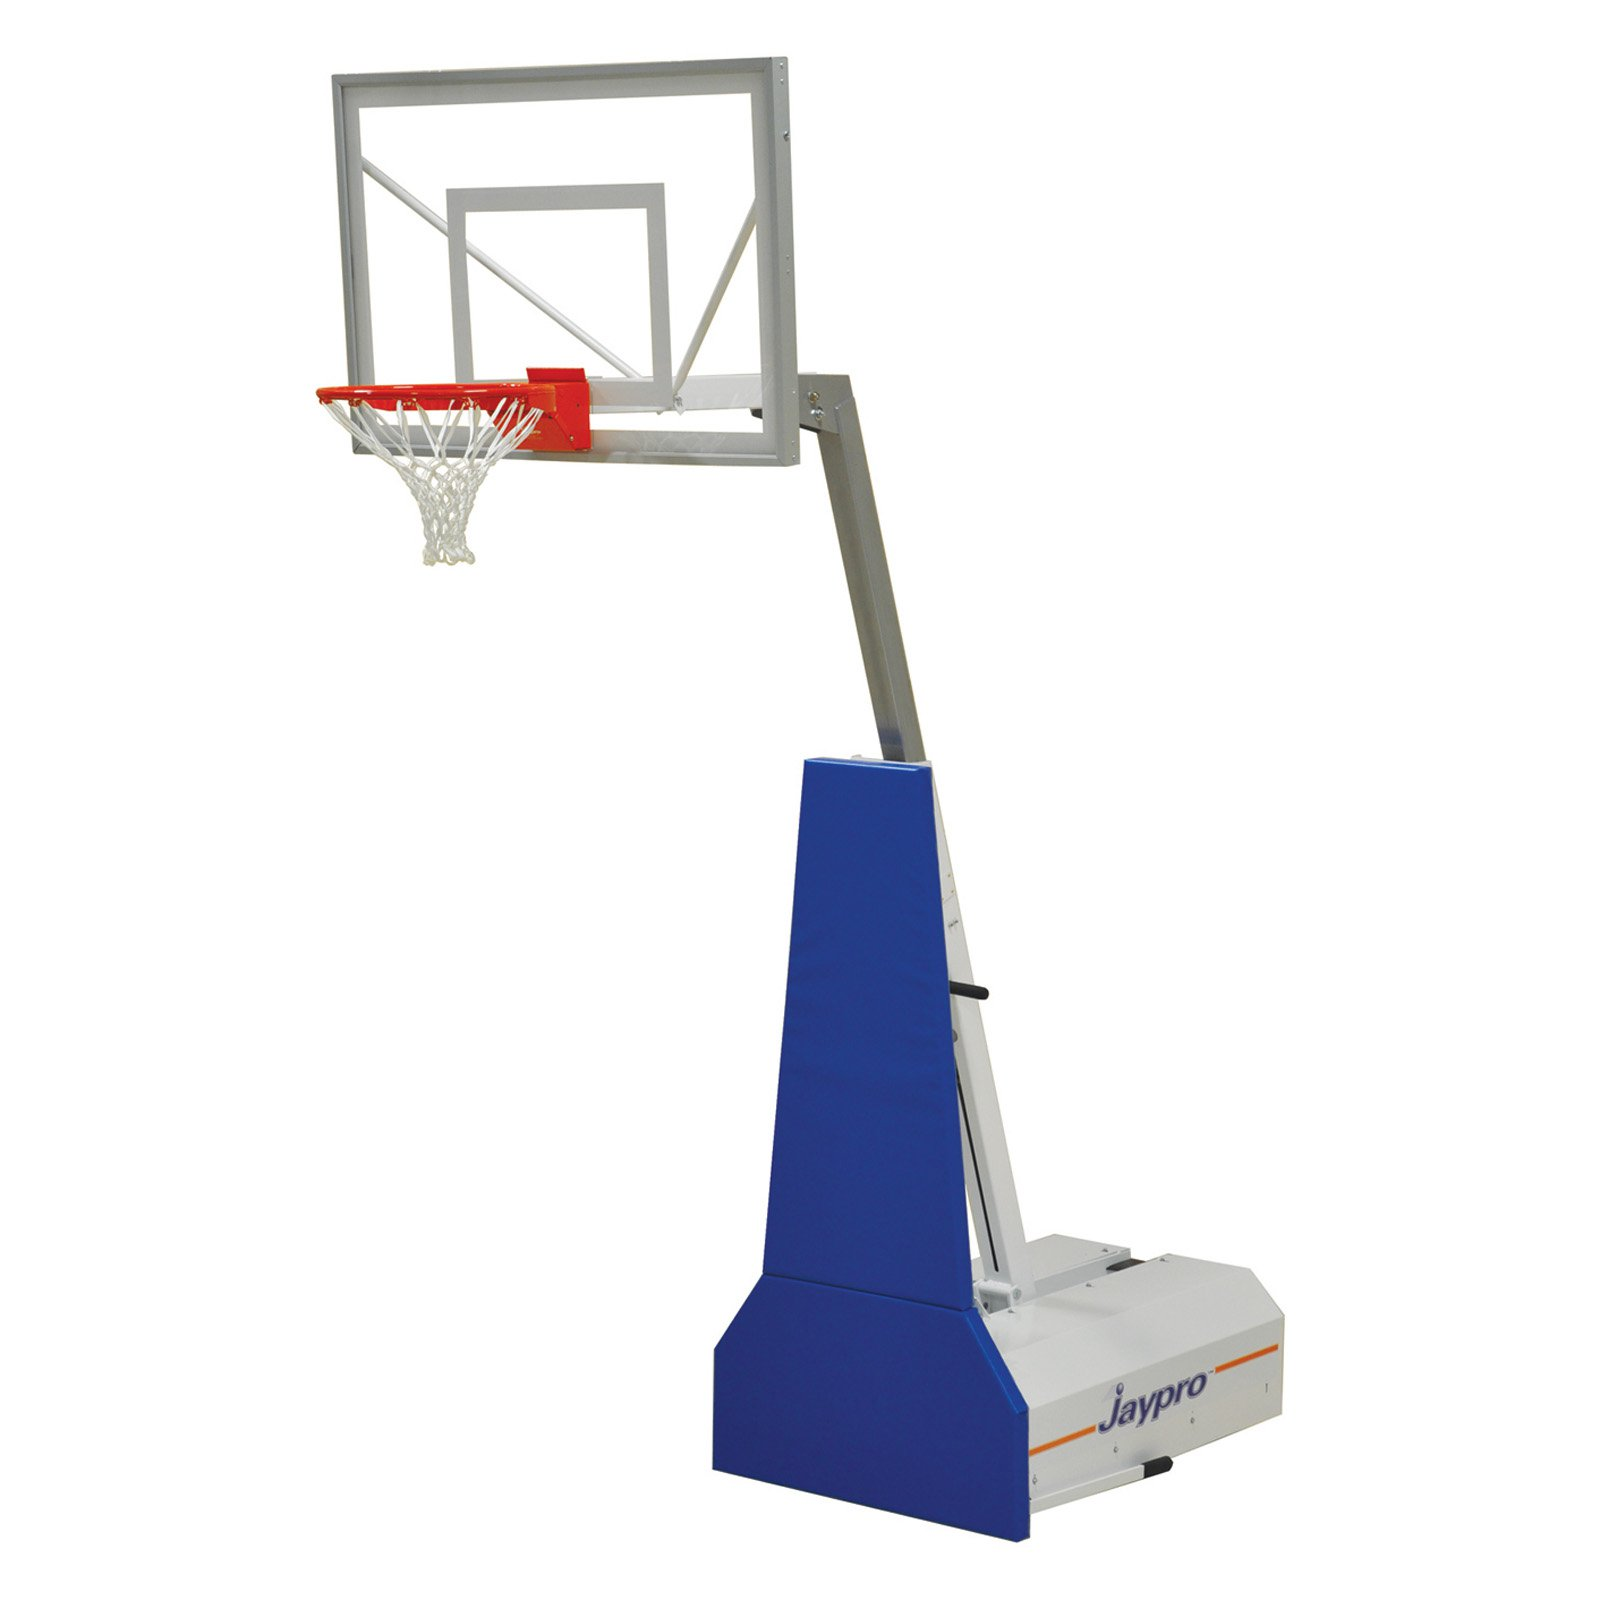 Jaypro Indoor Portable Basketball Goal Unit - Walmart.com